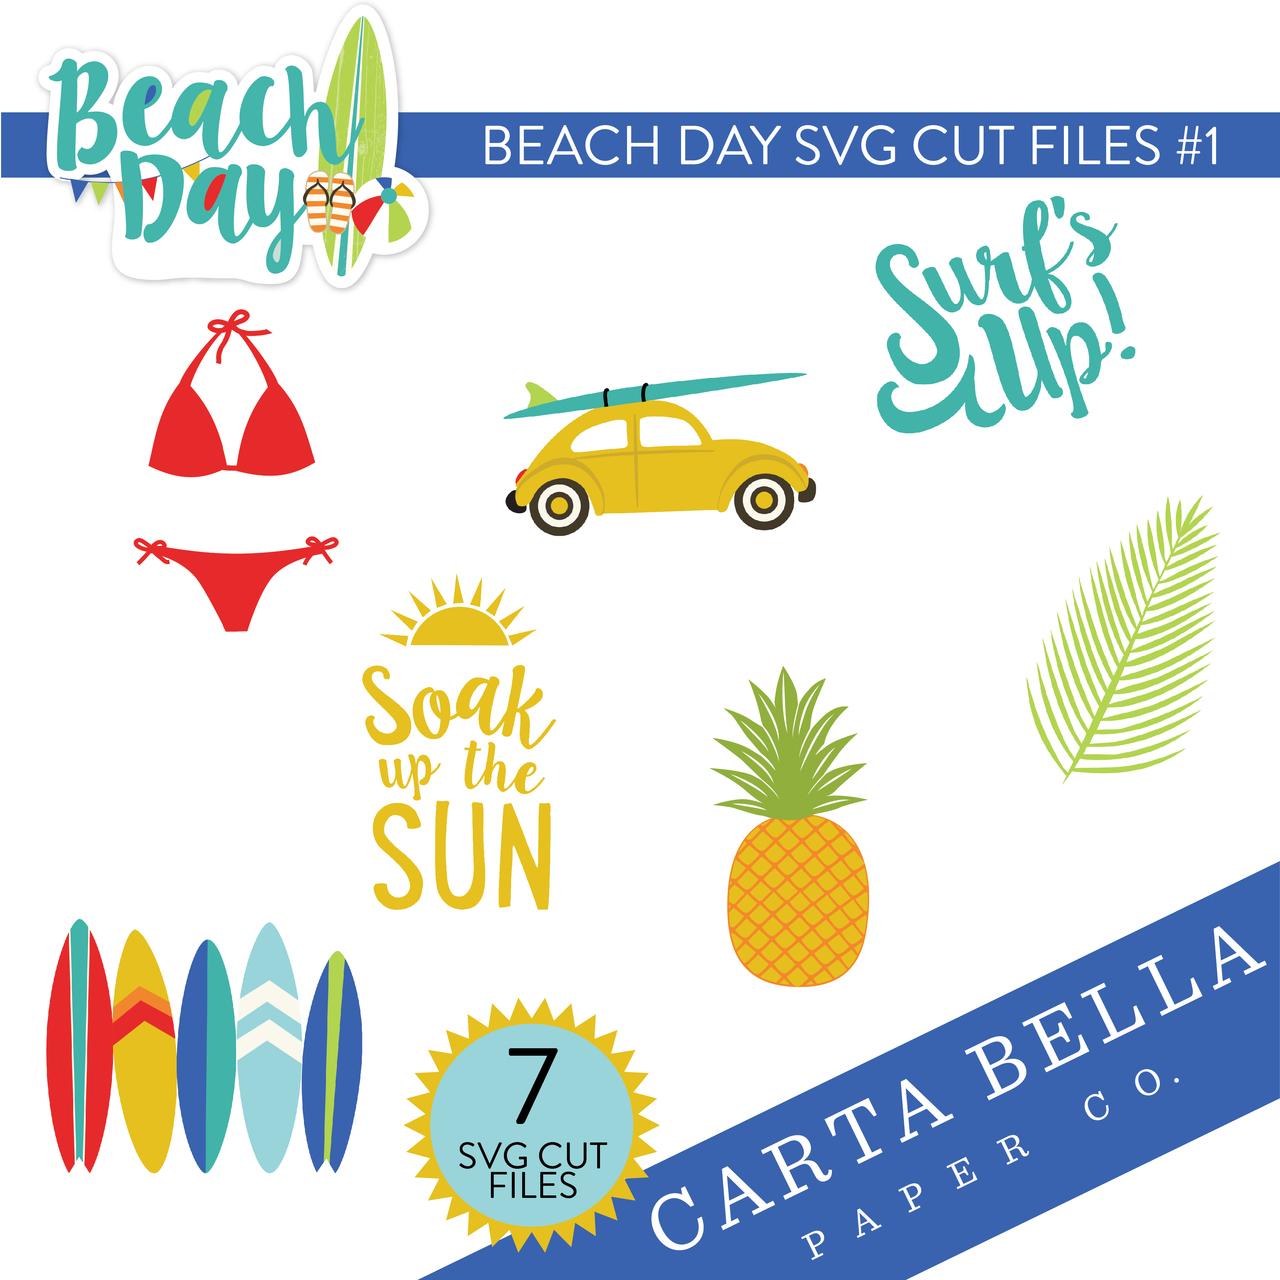 Beach Day SVG Cut Files #1